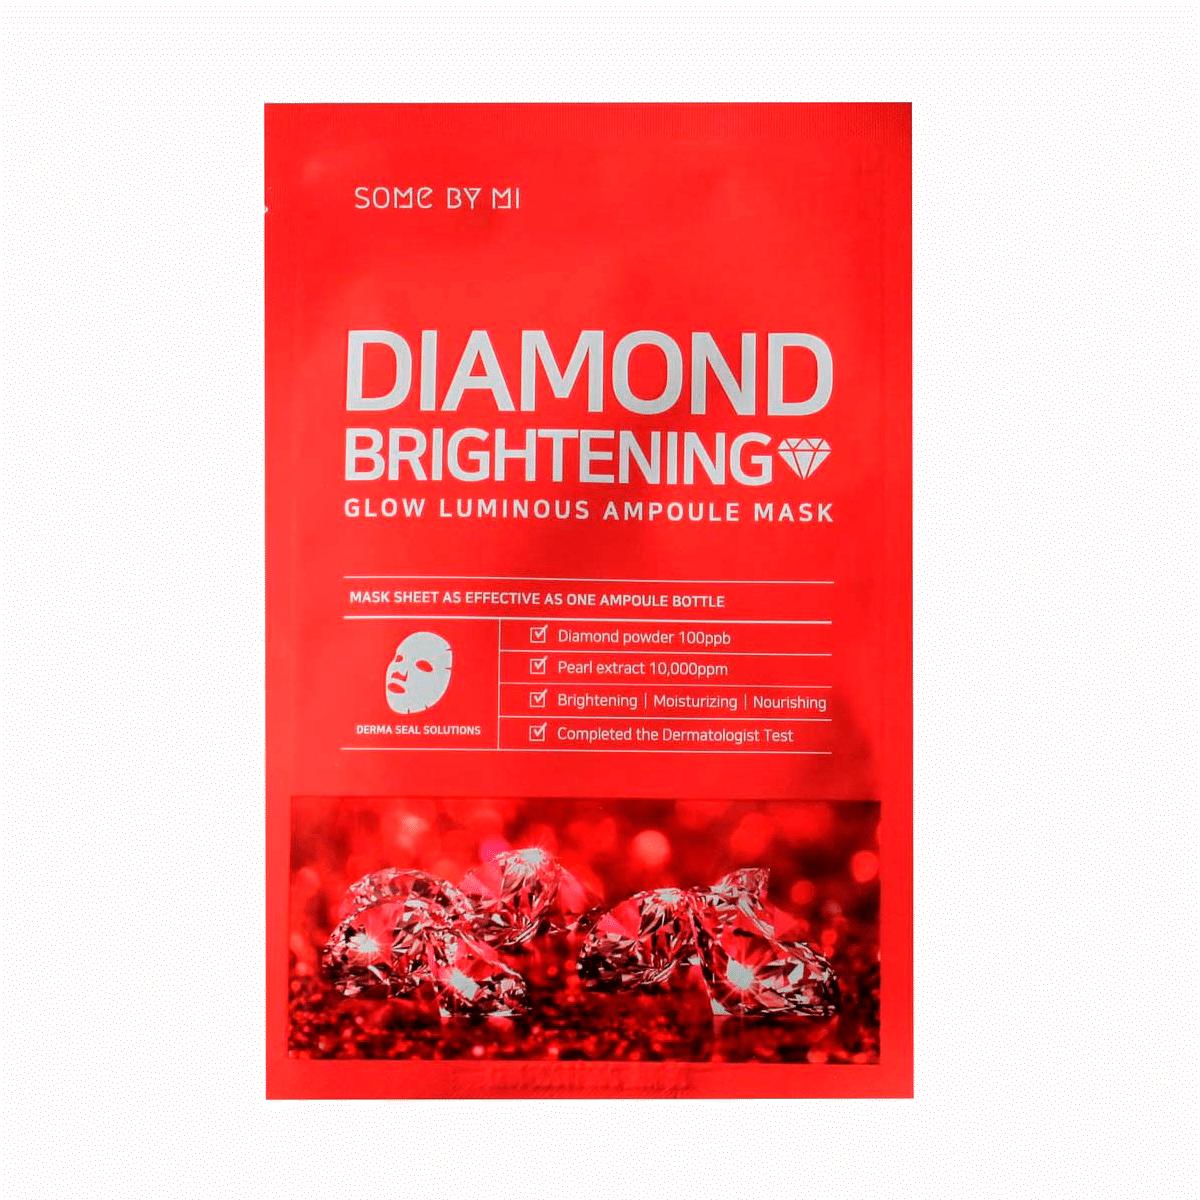 Some By Mi - Diamond Brightening Calming Glow Luminous Ampoule Mask 1